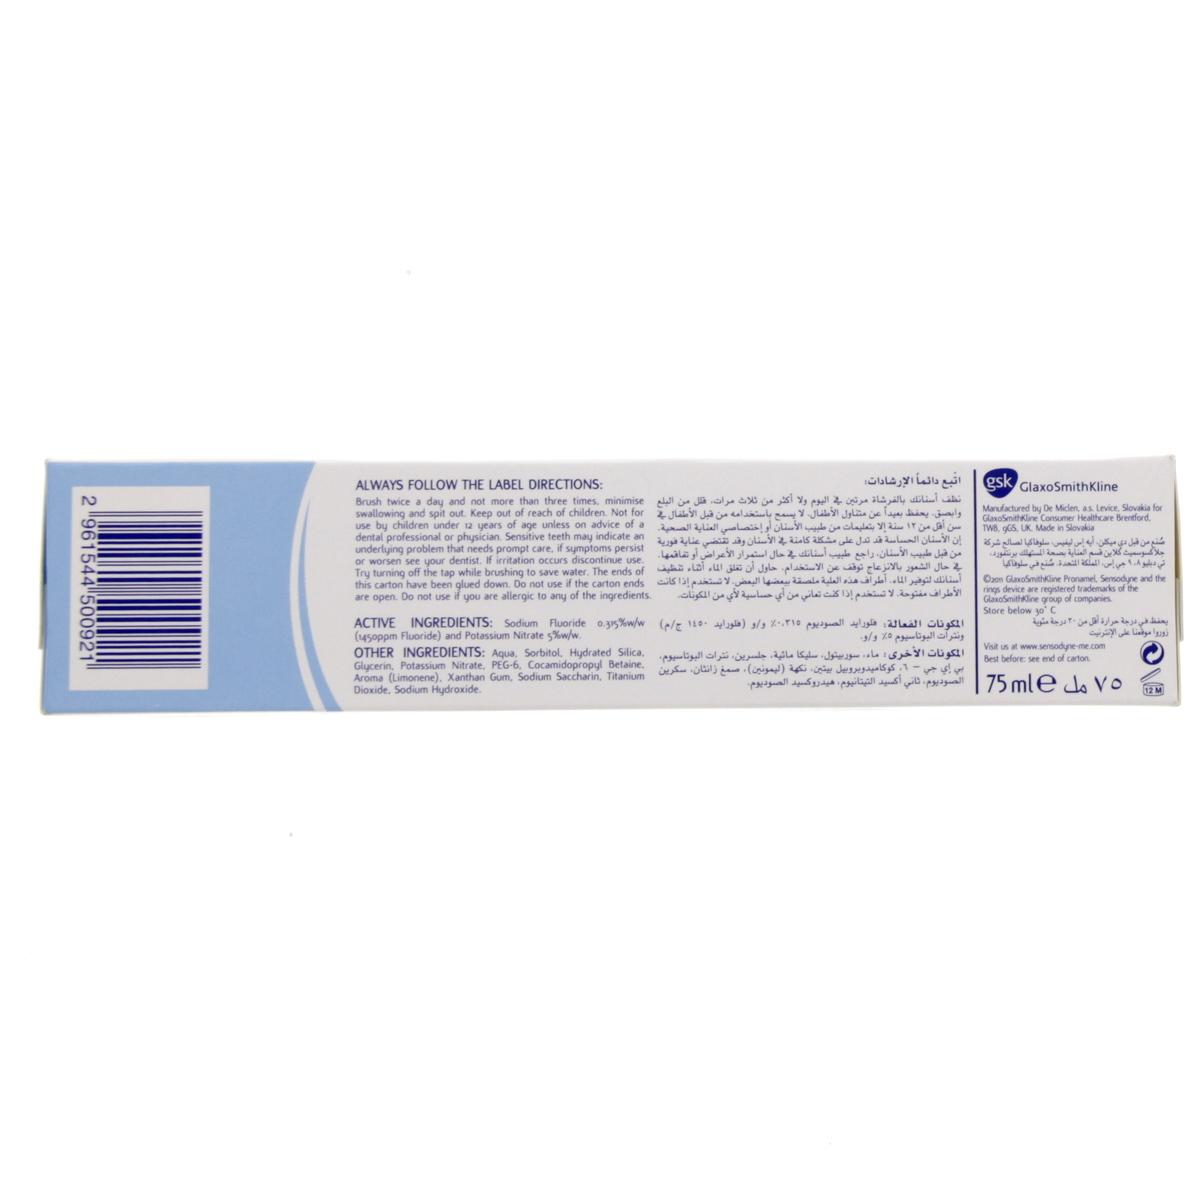 Buy Sensodyne Toothpaste Pronamel Gentle Whitening 75 ml